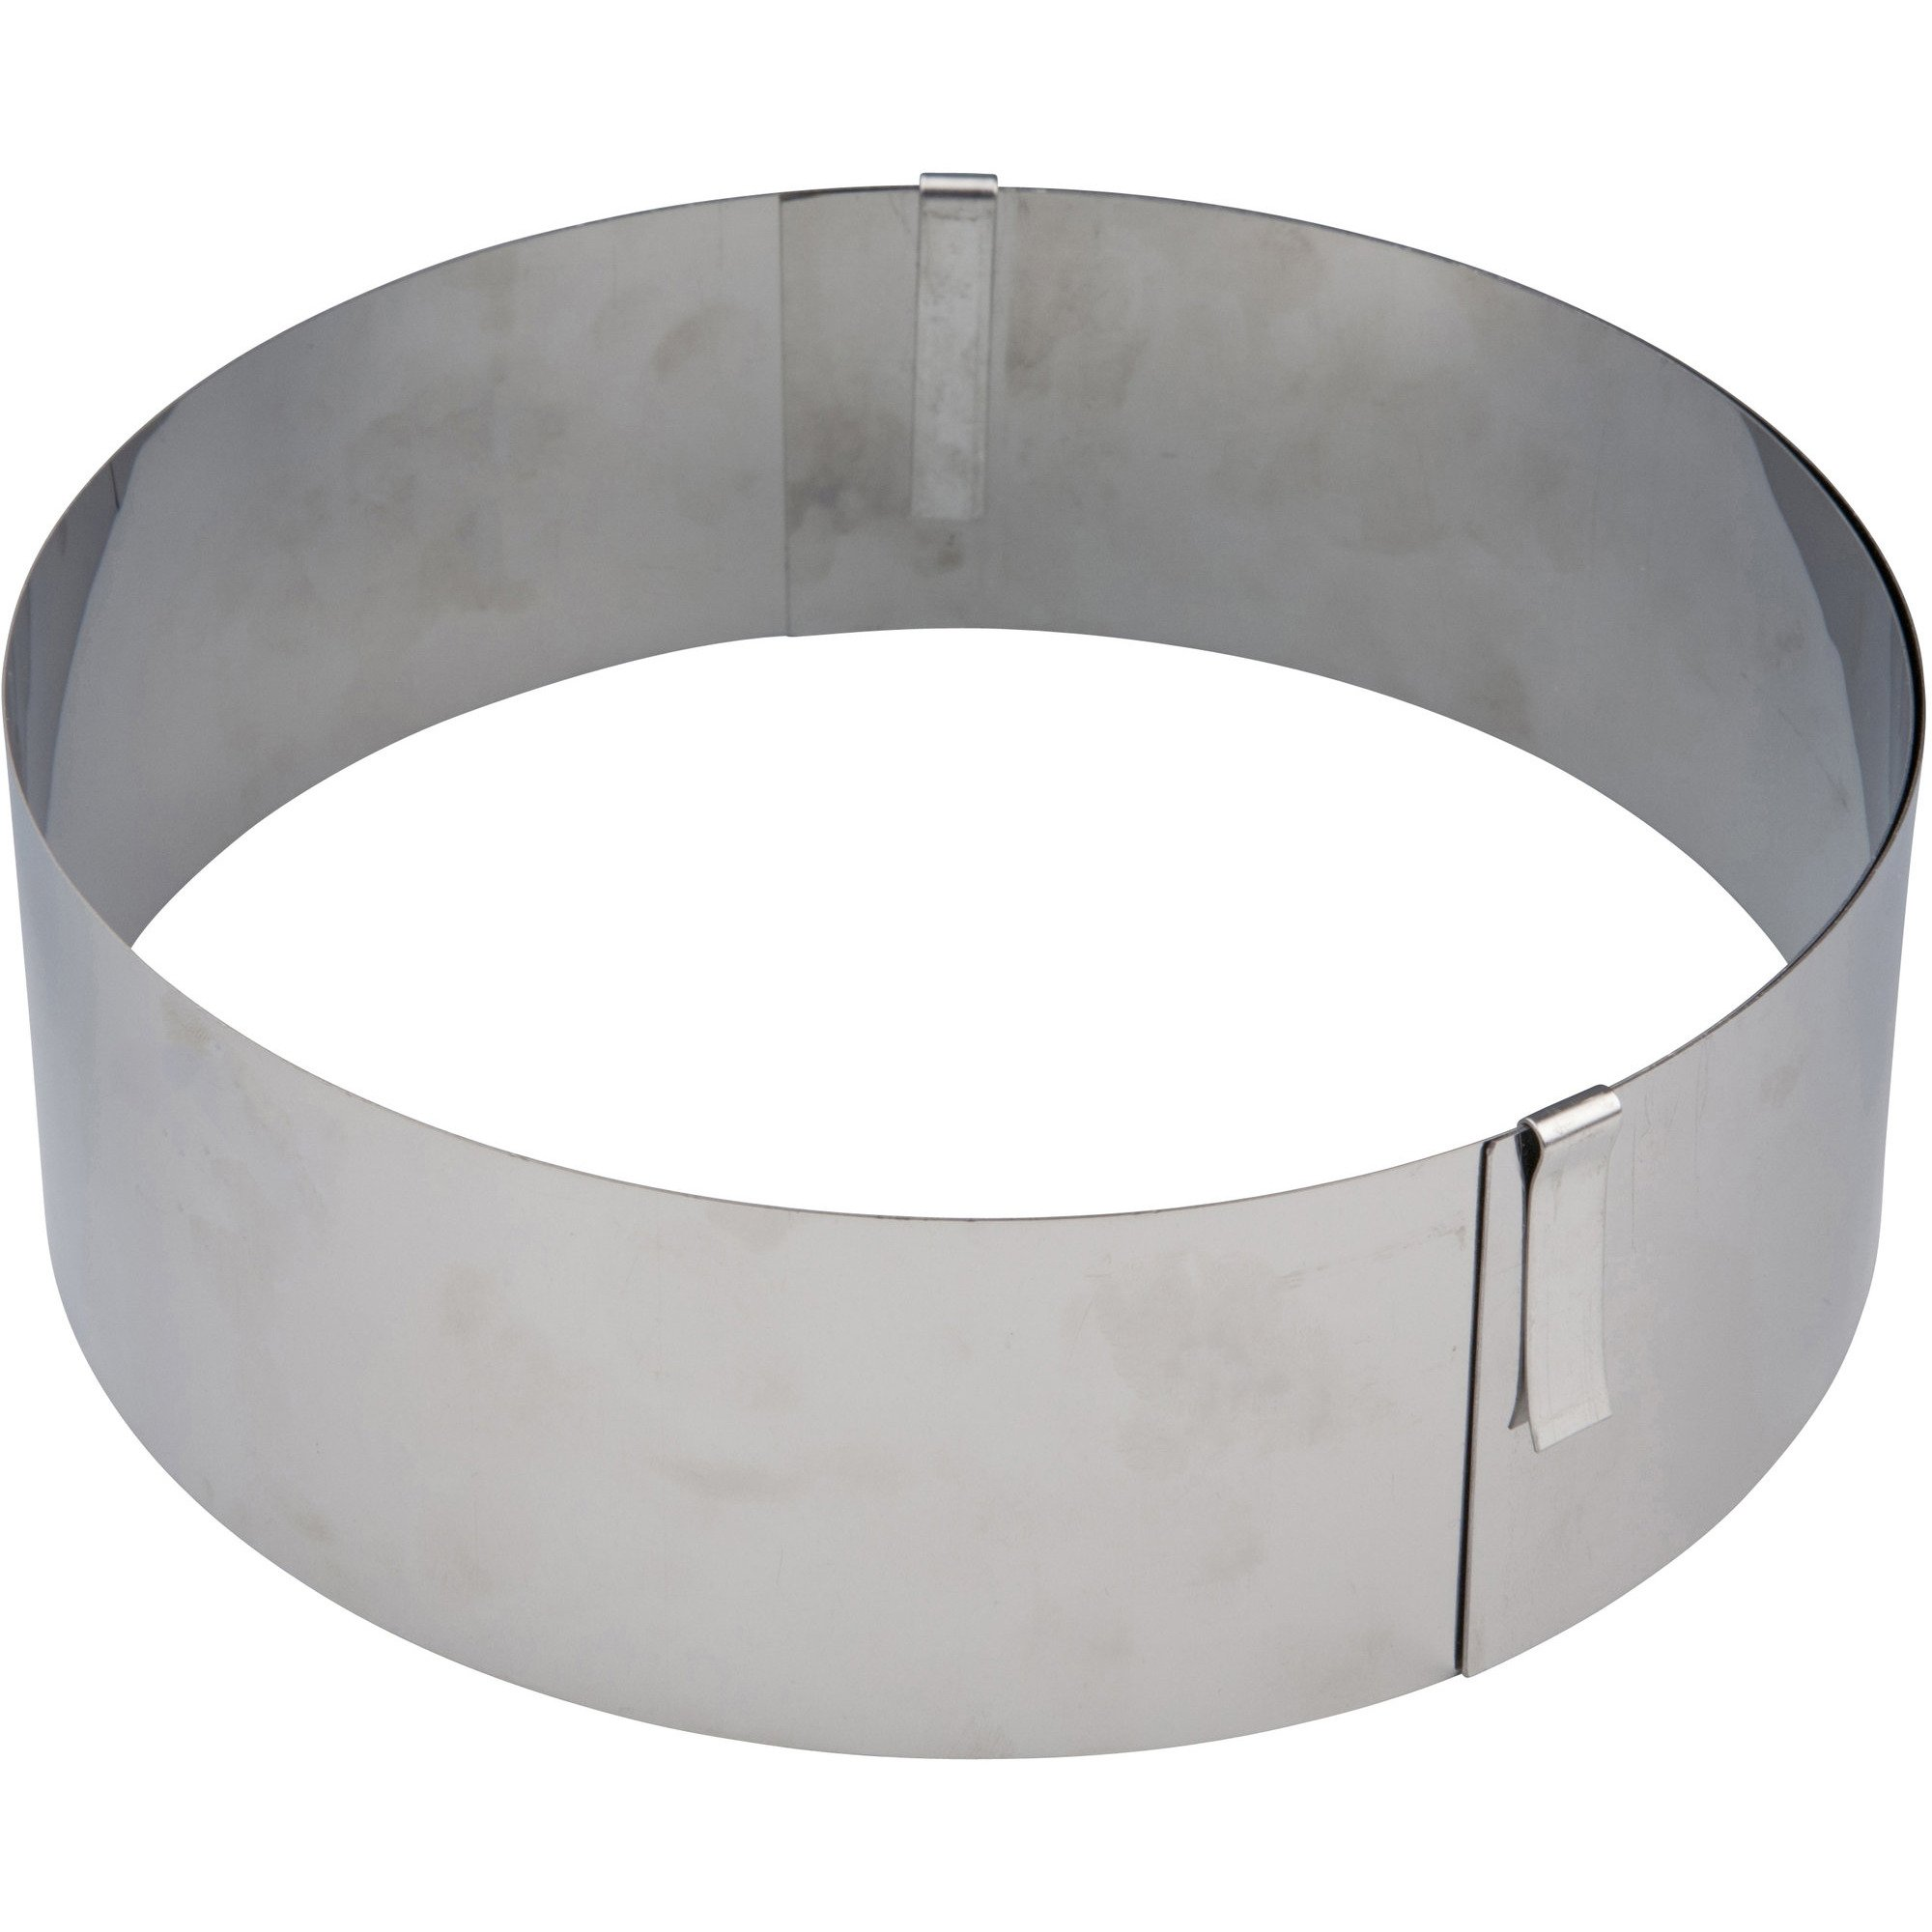 Bakform  springform Ø15-31 cm. 776a10aa4c555